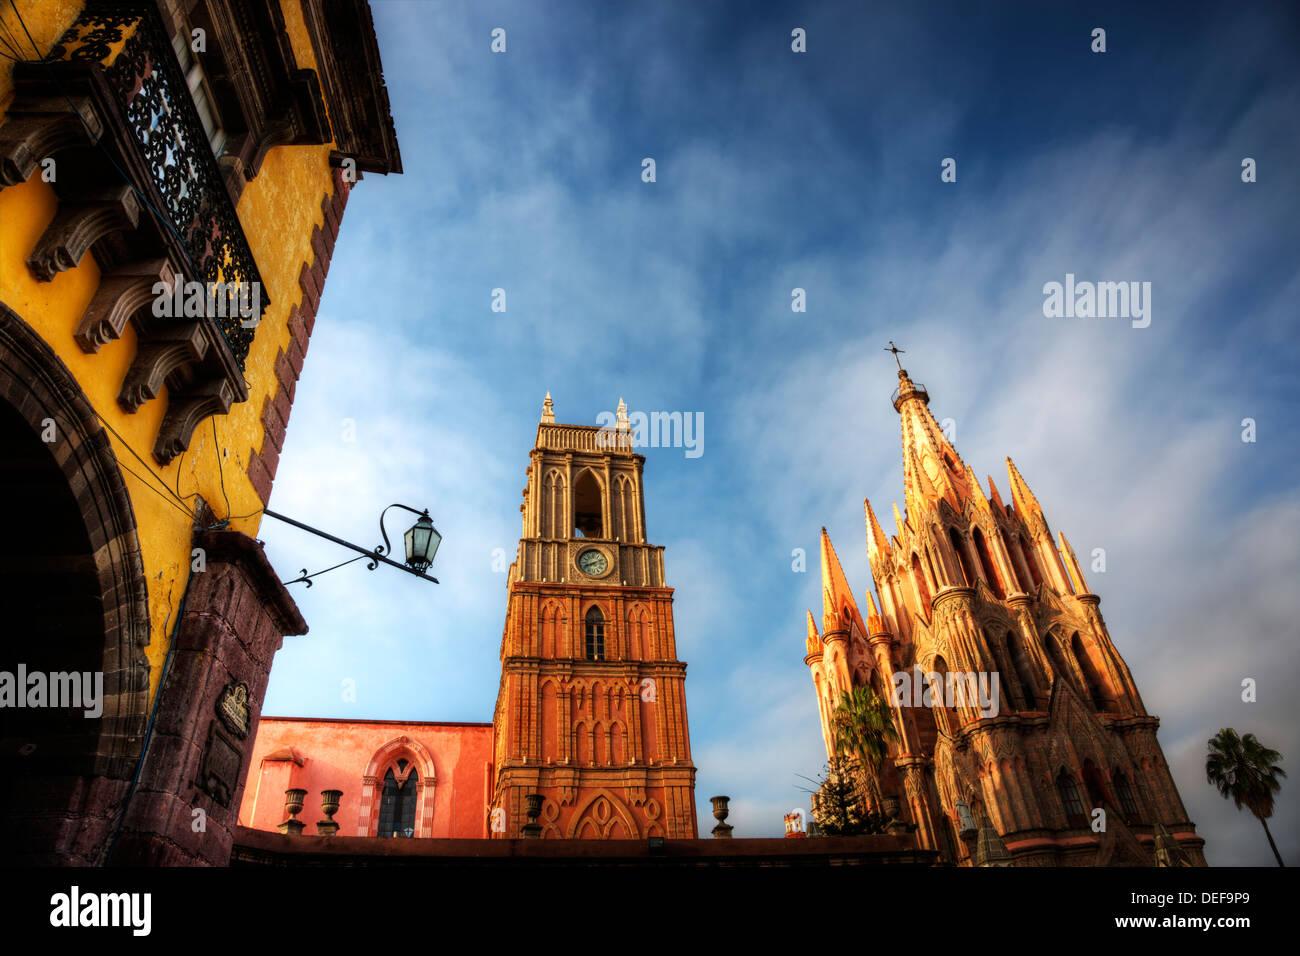 The morning sun illuminates the spires of the Parroquia de San Migulel Arcangel. - Stock Image